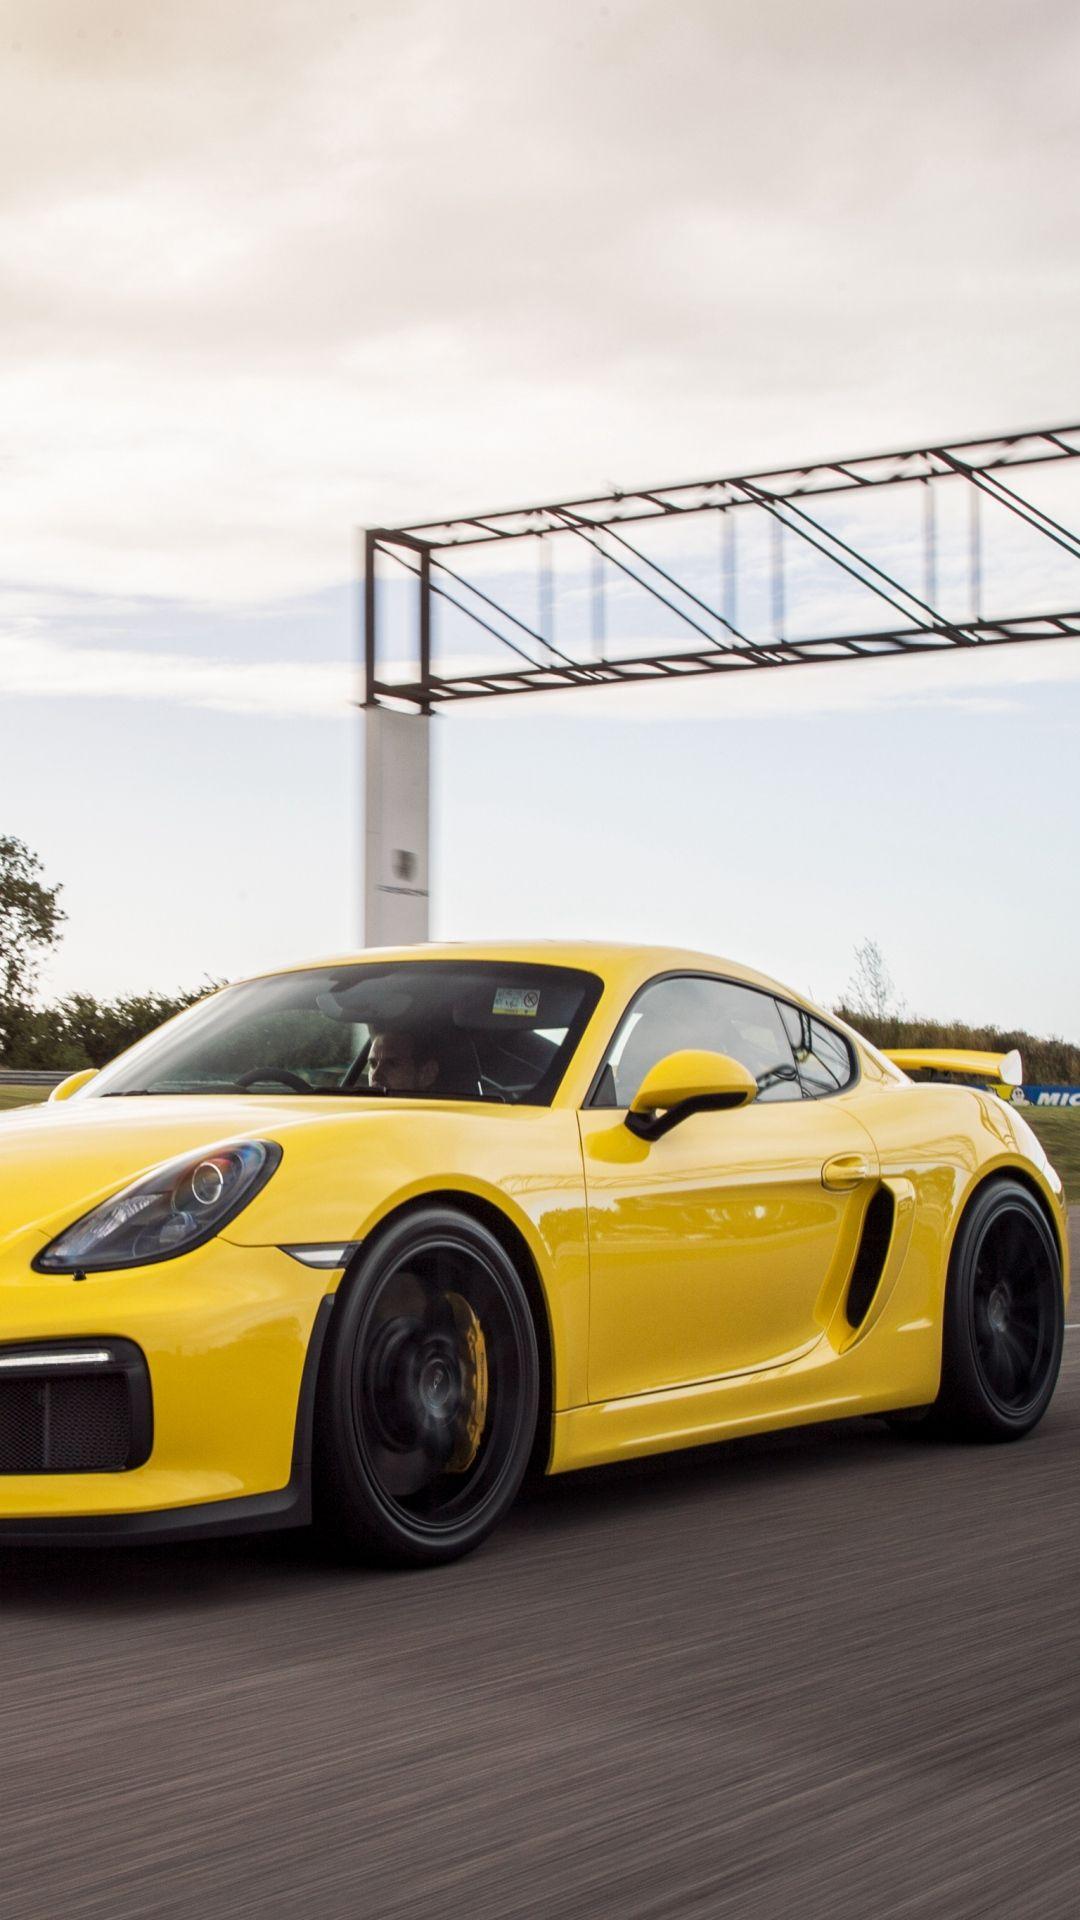 Porsche Cayman Gt4 1080x1920 Cayman Gt4 Porsche Gt4 Porsche